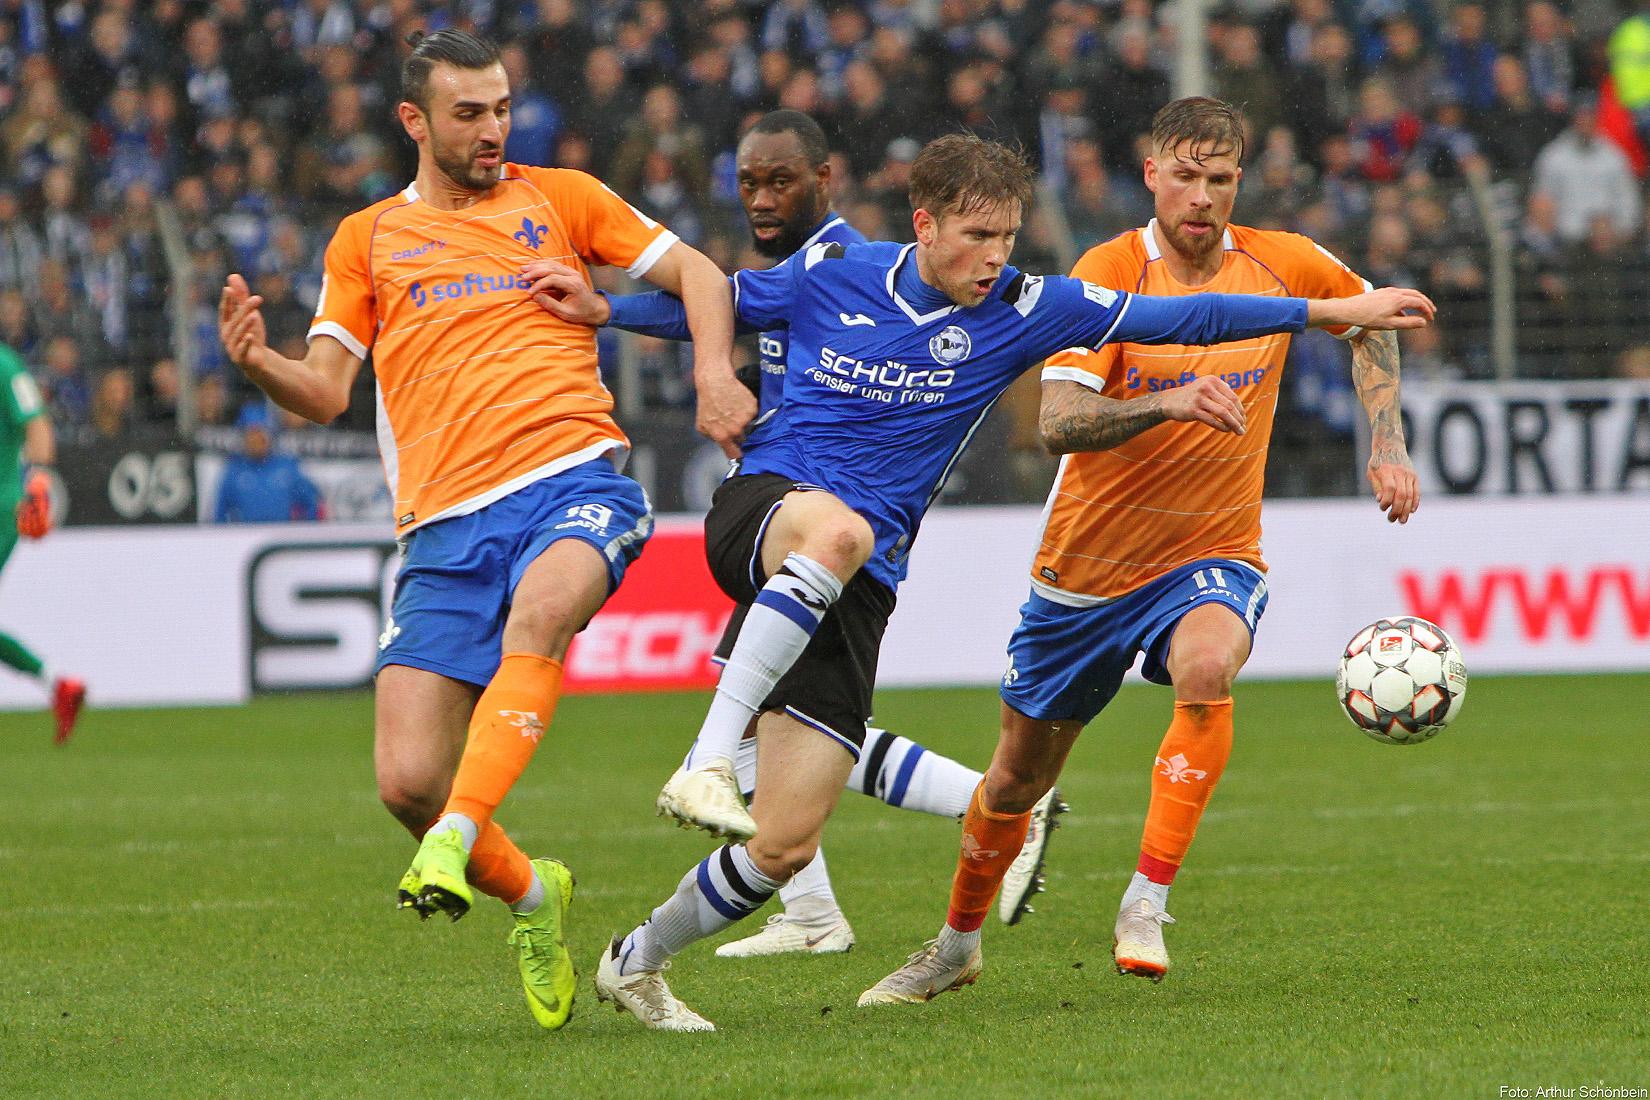 Arminia Bielefeld – SV Darmstadt 98 1:0 (1:0)